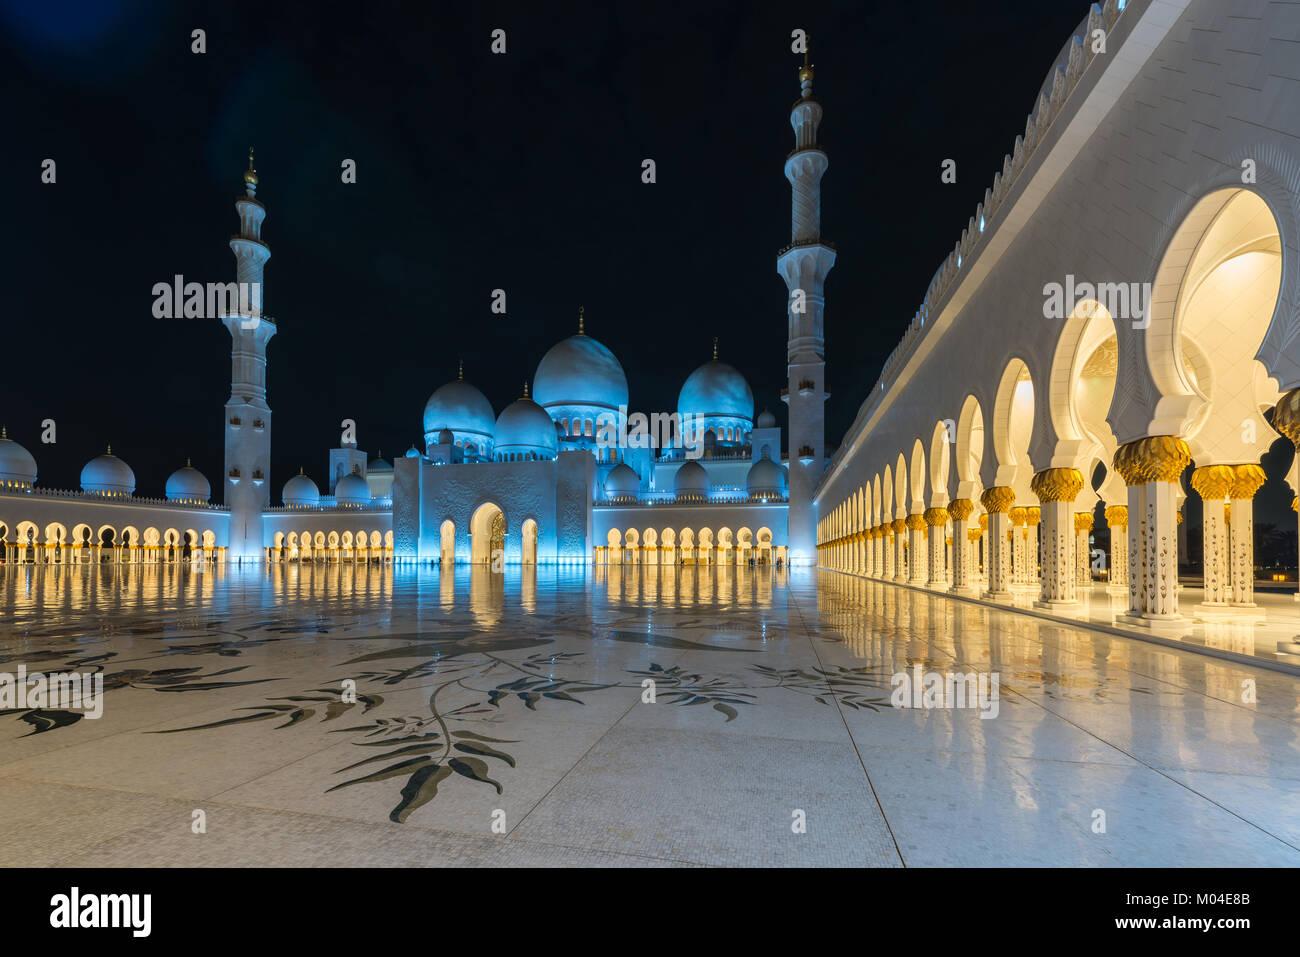 La arquitectura de la Gran Mezquita de Sheikh Zayed, en Abu Dhabi, Emiratos Árabes Unidos Foto de stock